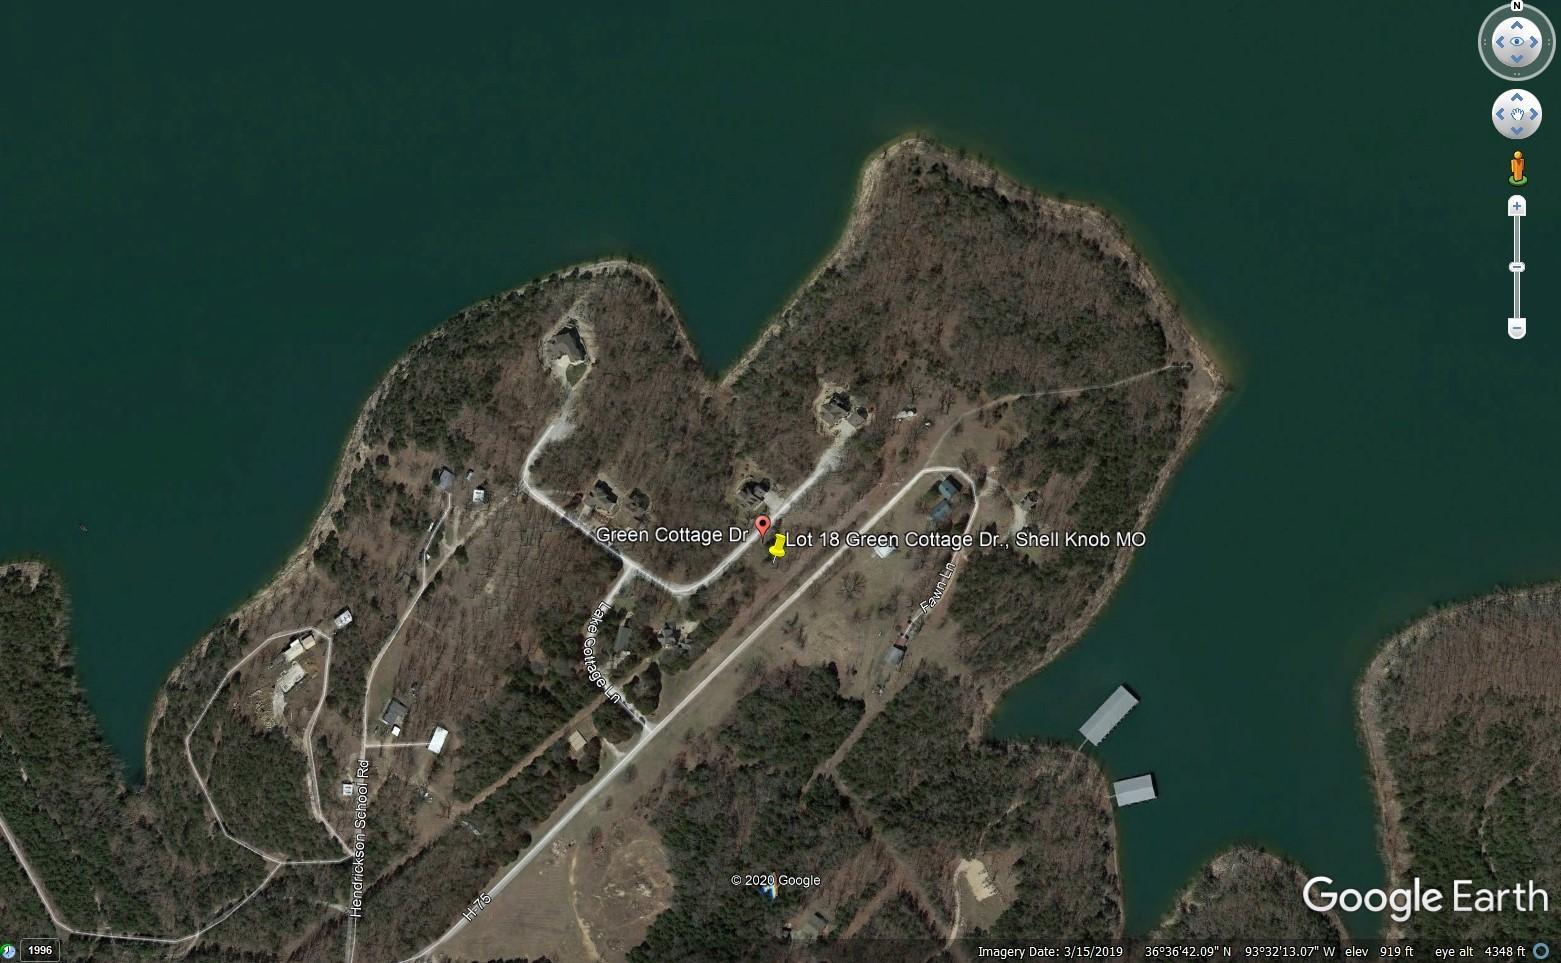 18 Green Cottage Drive Shell Knob, MO 65747